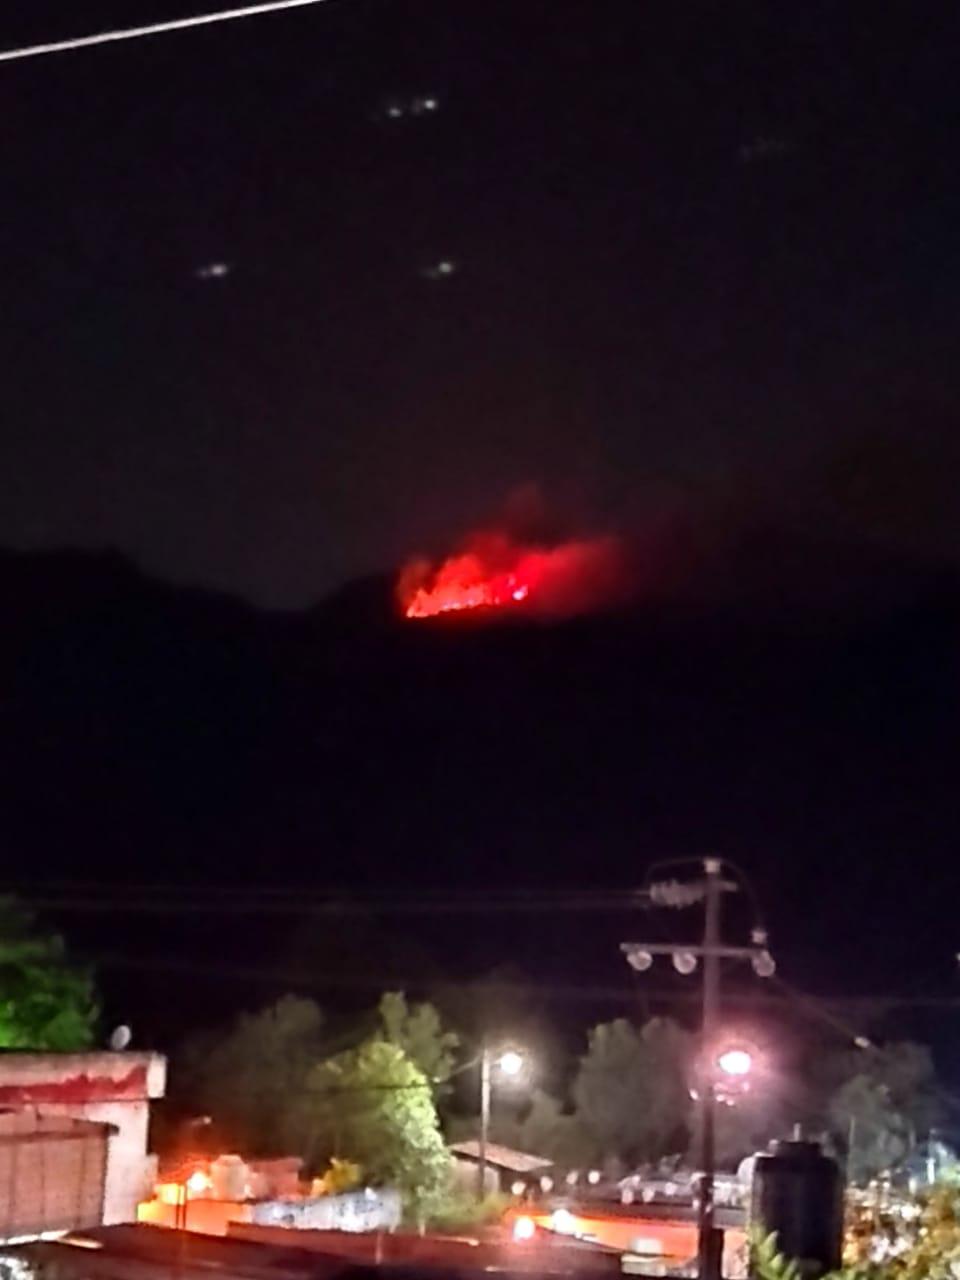 Fotonota: Reportan incendio forestal en Huauchinango